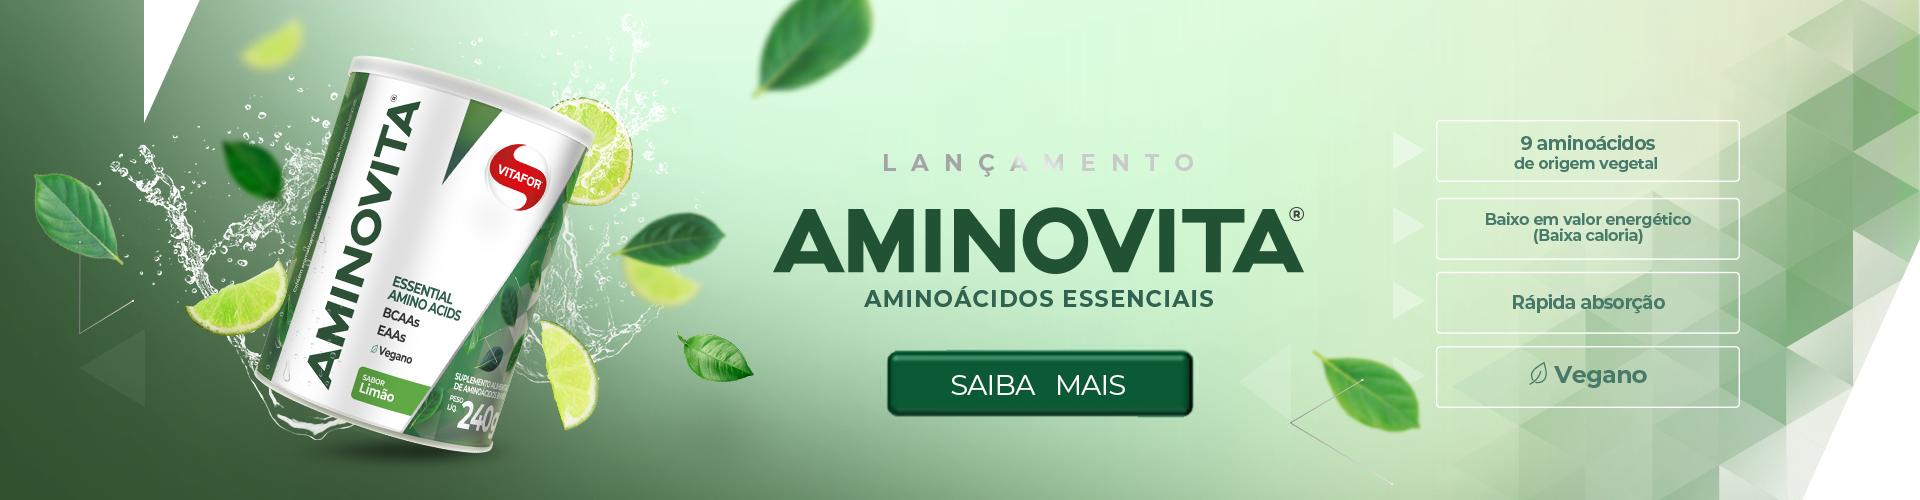 Produto Aminovita®.